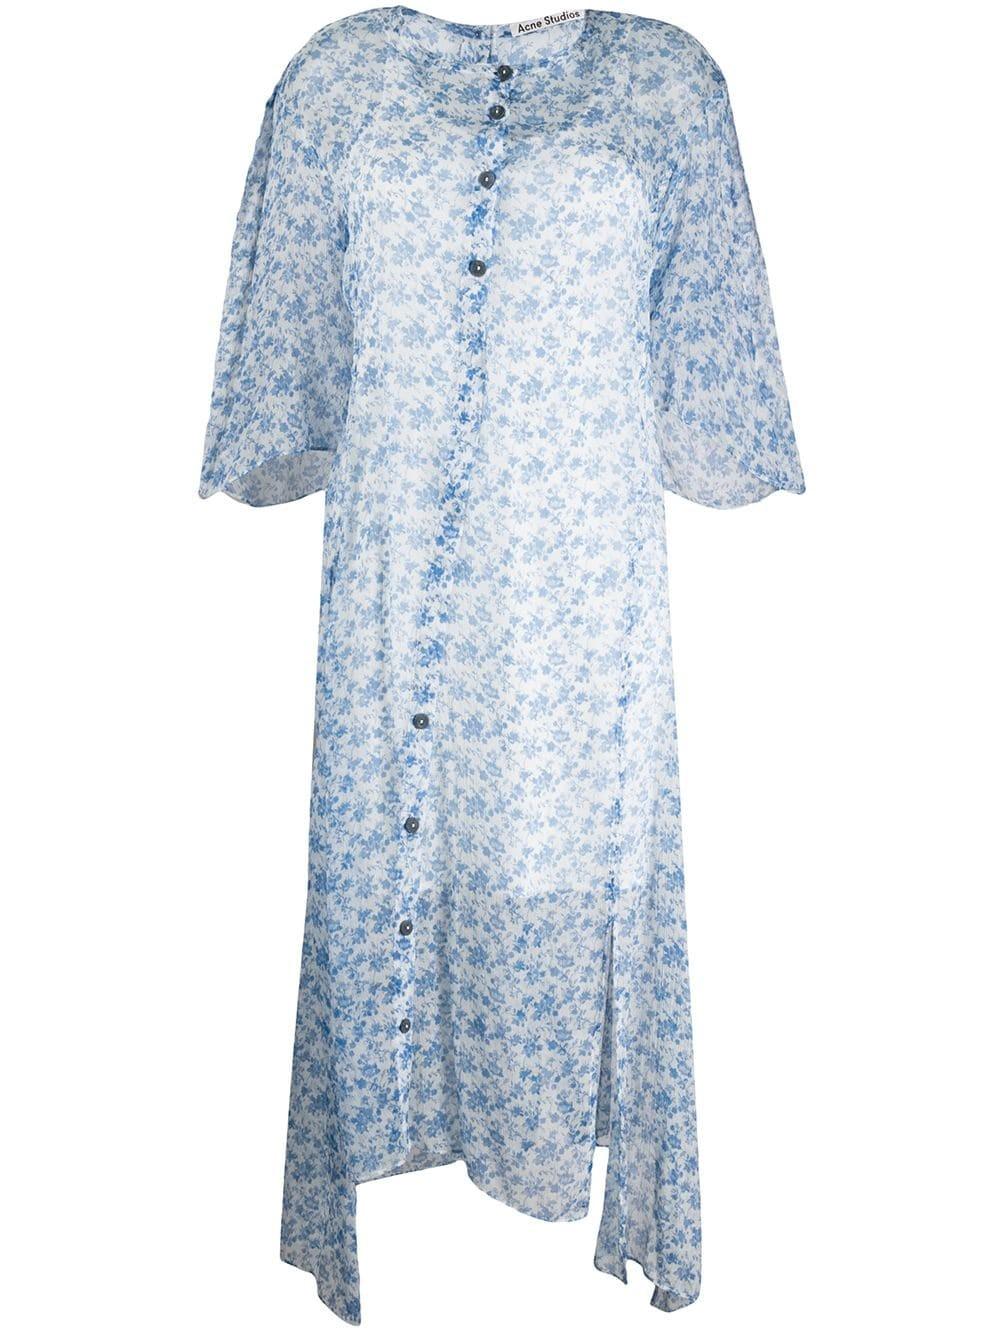 DAGNY CHIFFON DRESSES